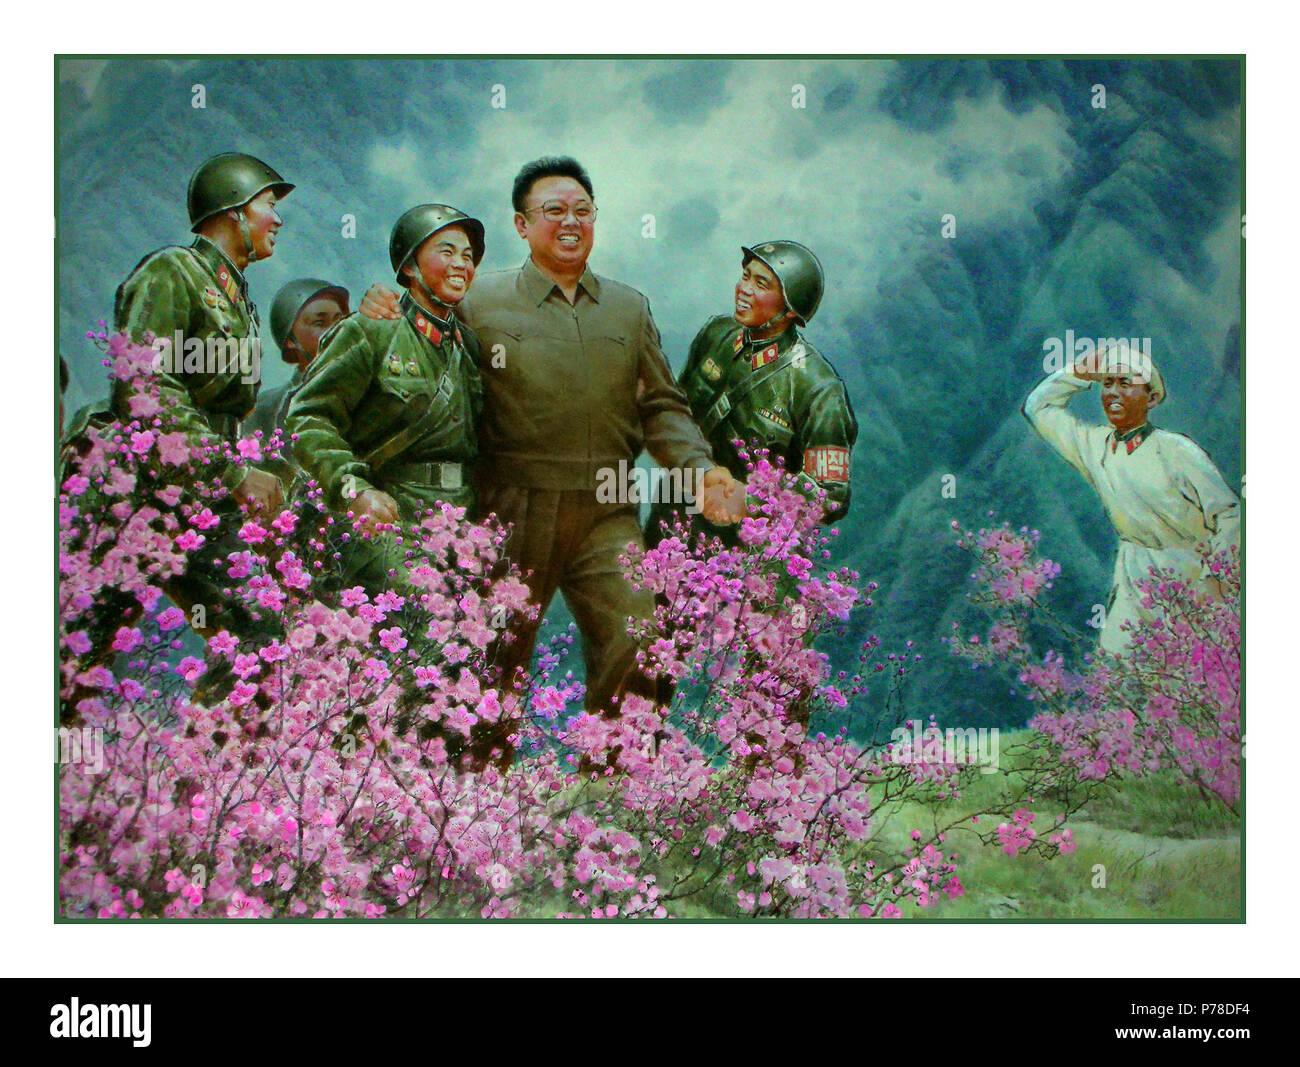 1960's Propaganda Vintage Wall Mural of Kim Il Sung, Pyongyang, Democratic People's Republic of Korea, North Korea DPRK - Stock Image